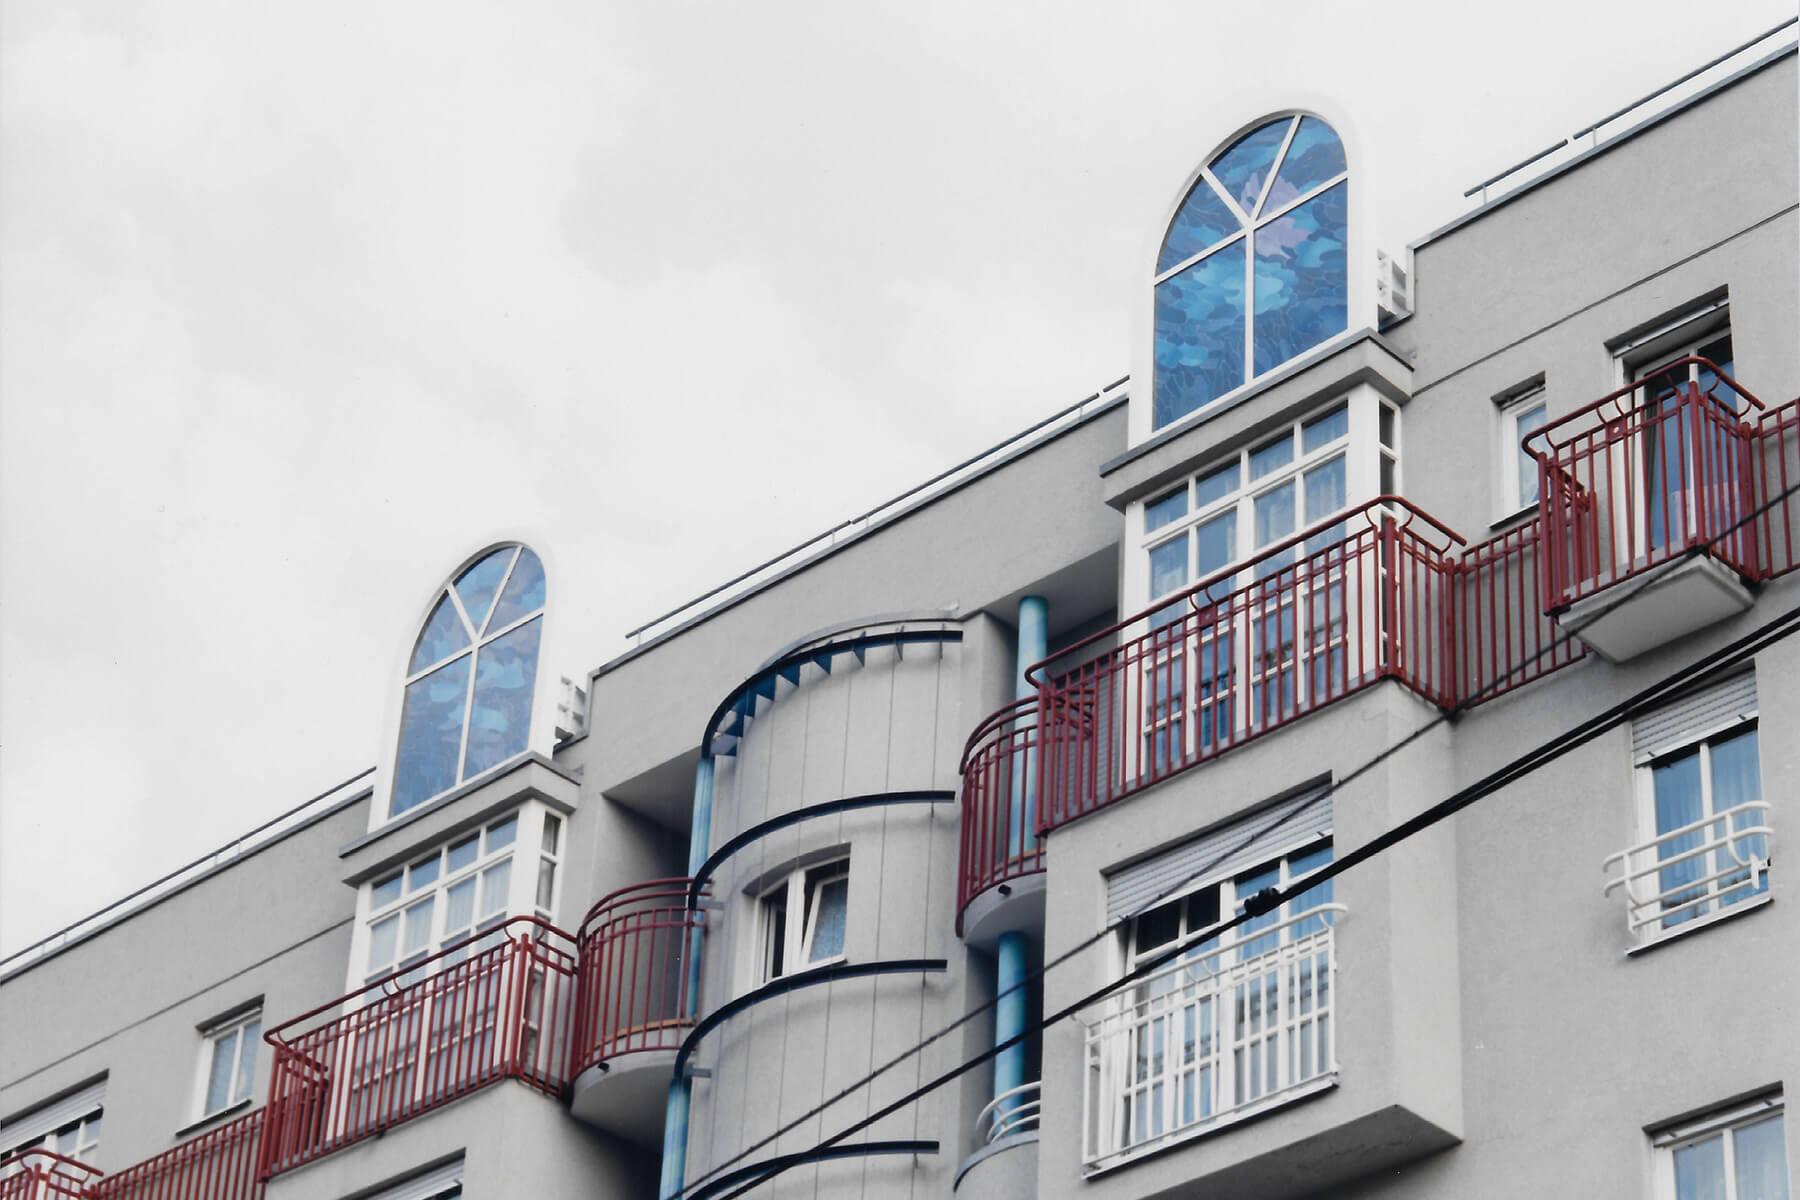 Barbara Jäger OMI Riesterer Gemeinsame öffentliche Werke Himmelsfenster Fassadengestaltung Binding Areal Karlsruhe